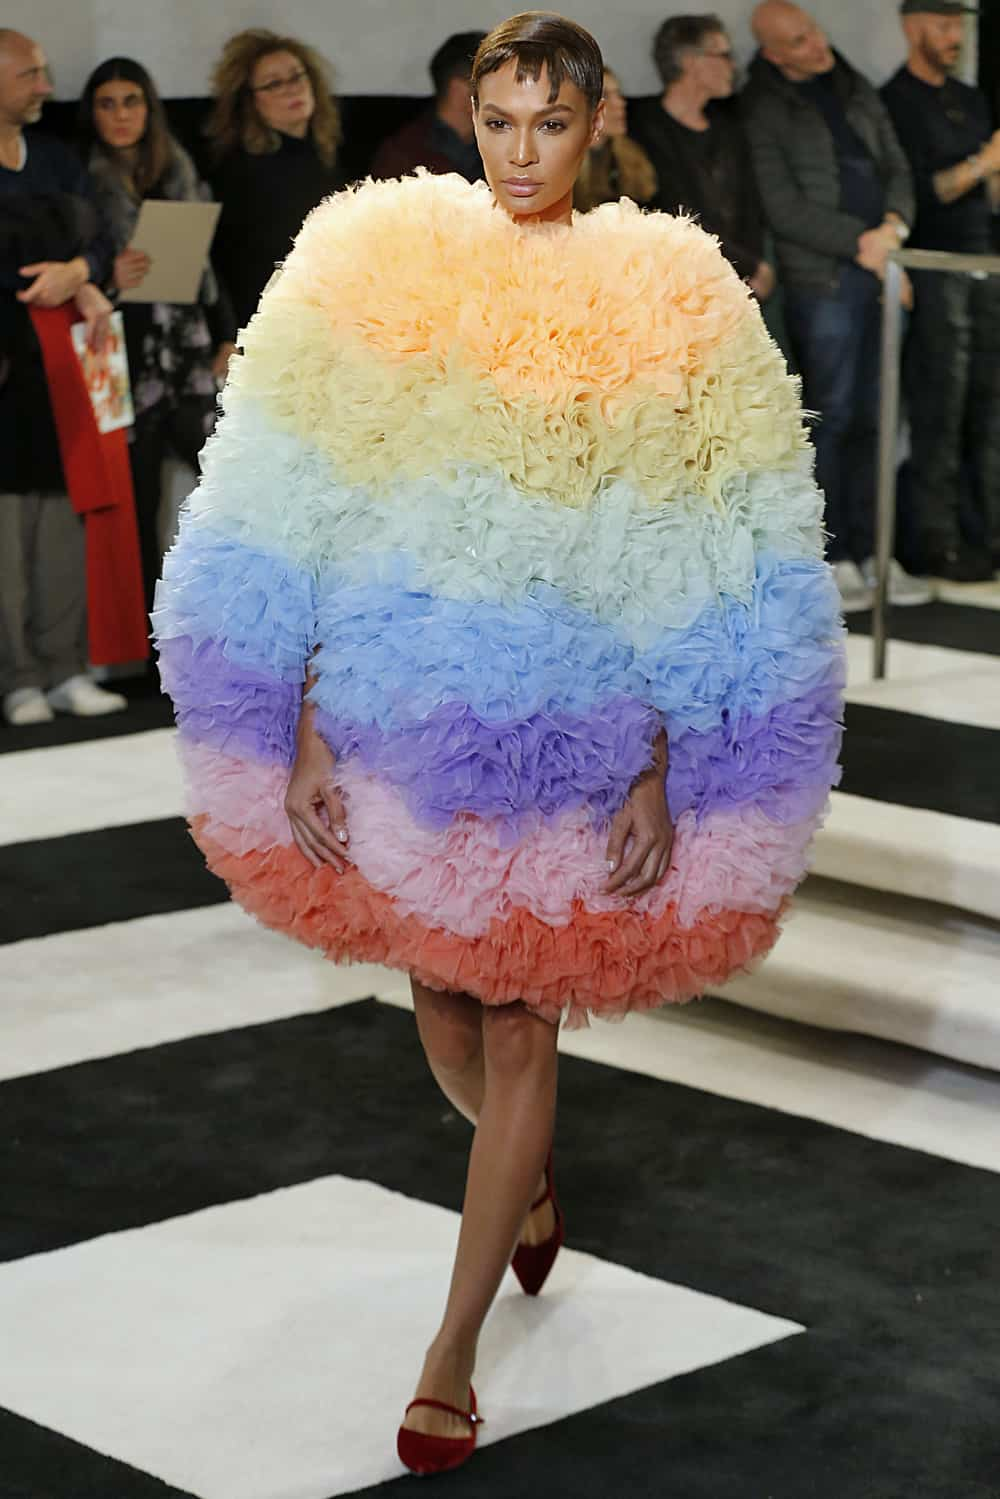 image via fashionweekdaily.com